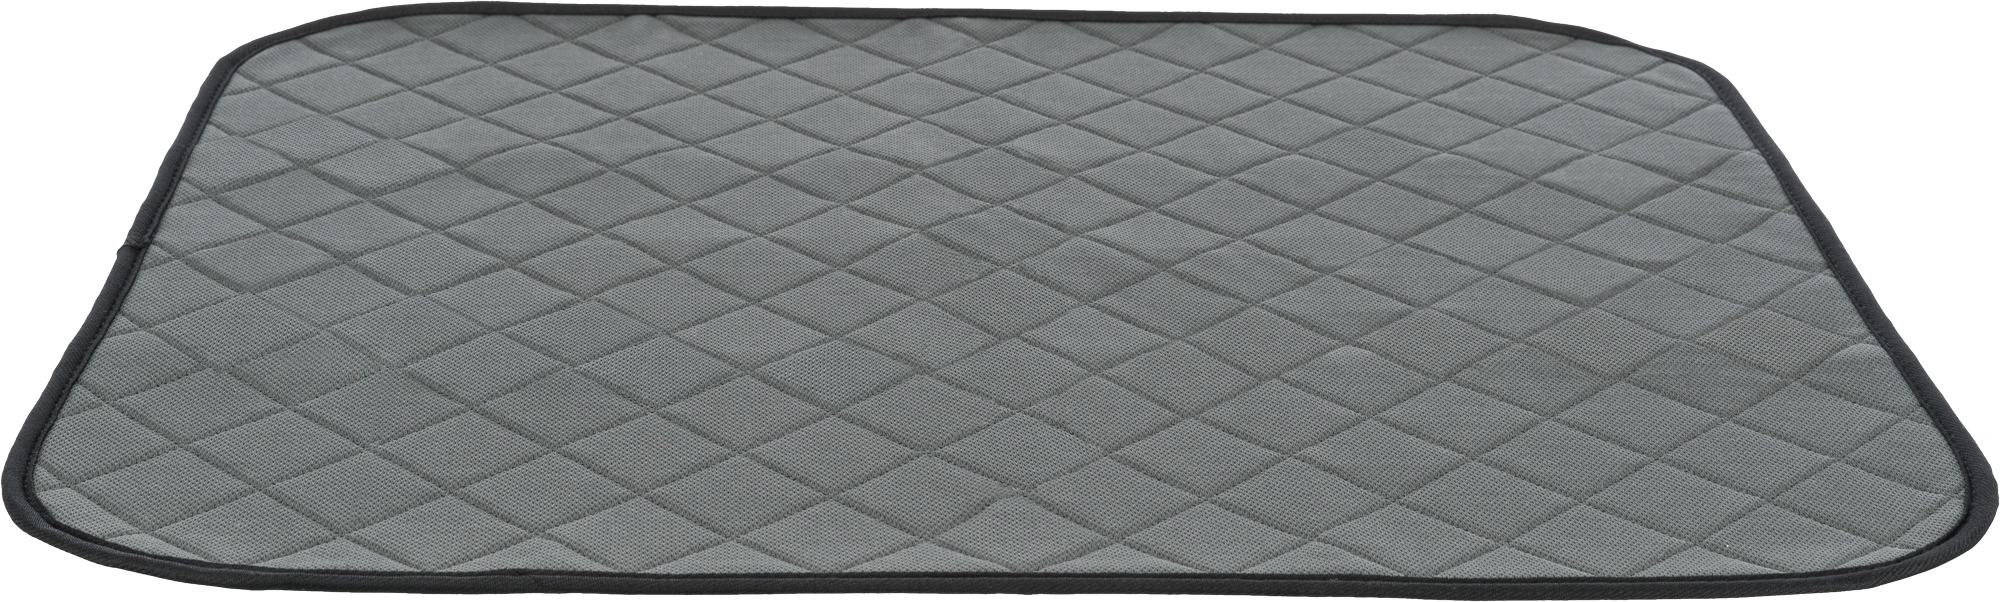 TRIXIE Hygiene-Unterlage Nappy Wash TRIXIE Hygiene-Unterlage Nappy Wash, 60 × 60 cm, grau